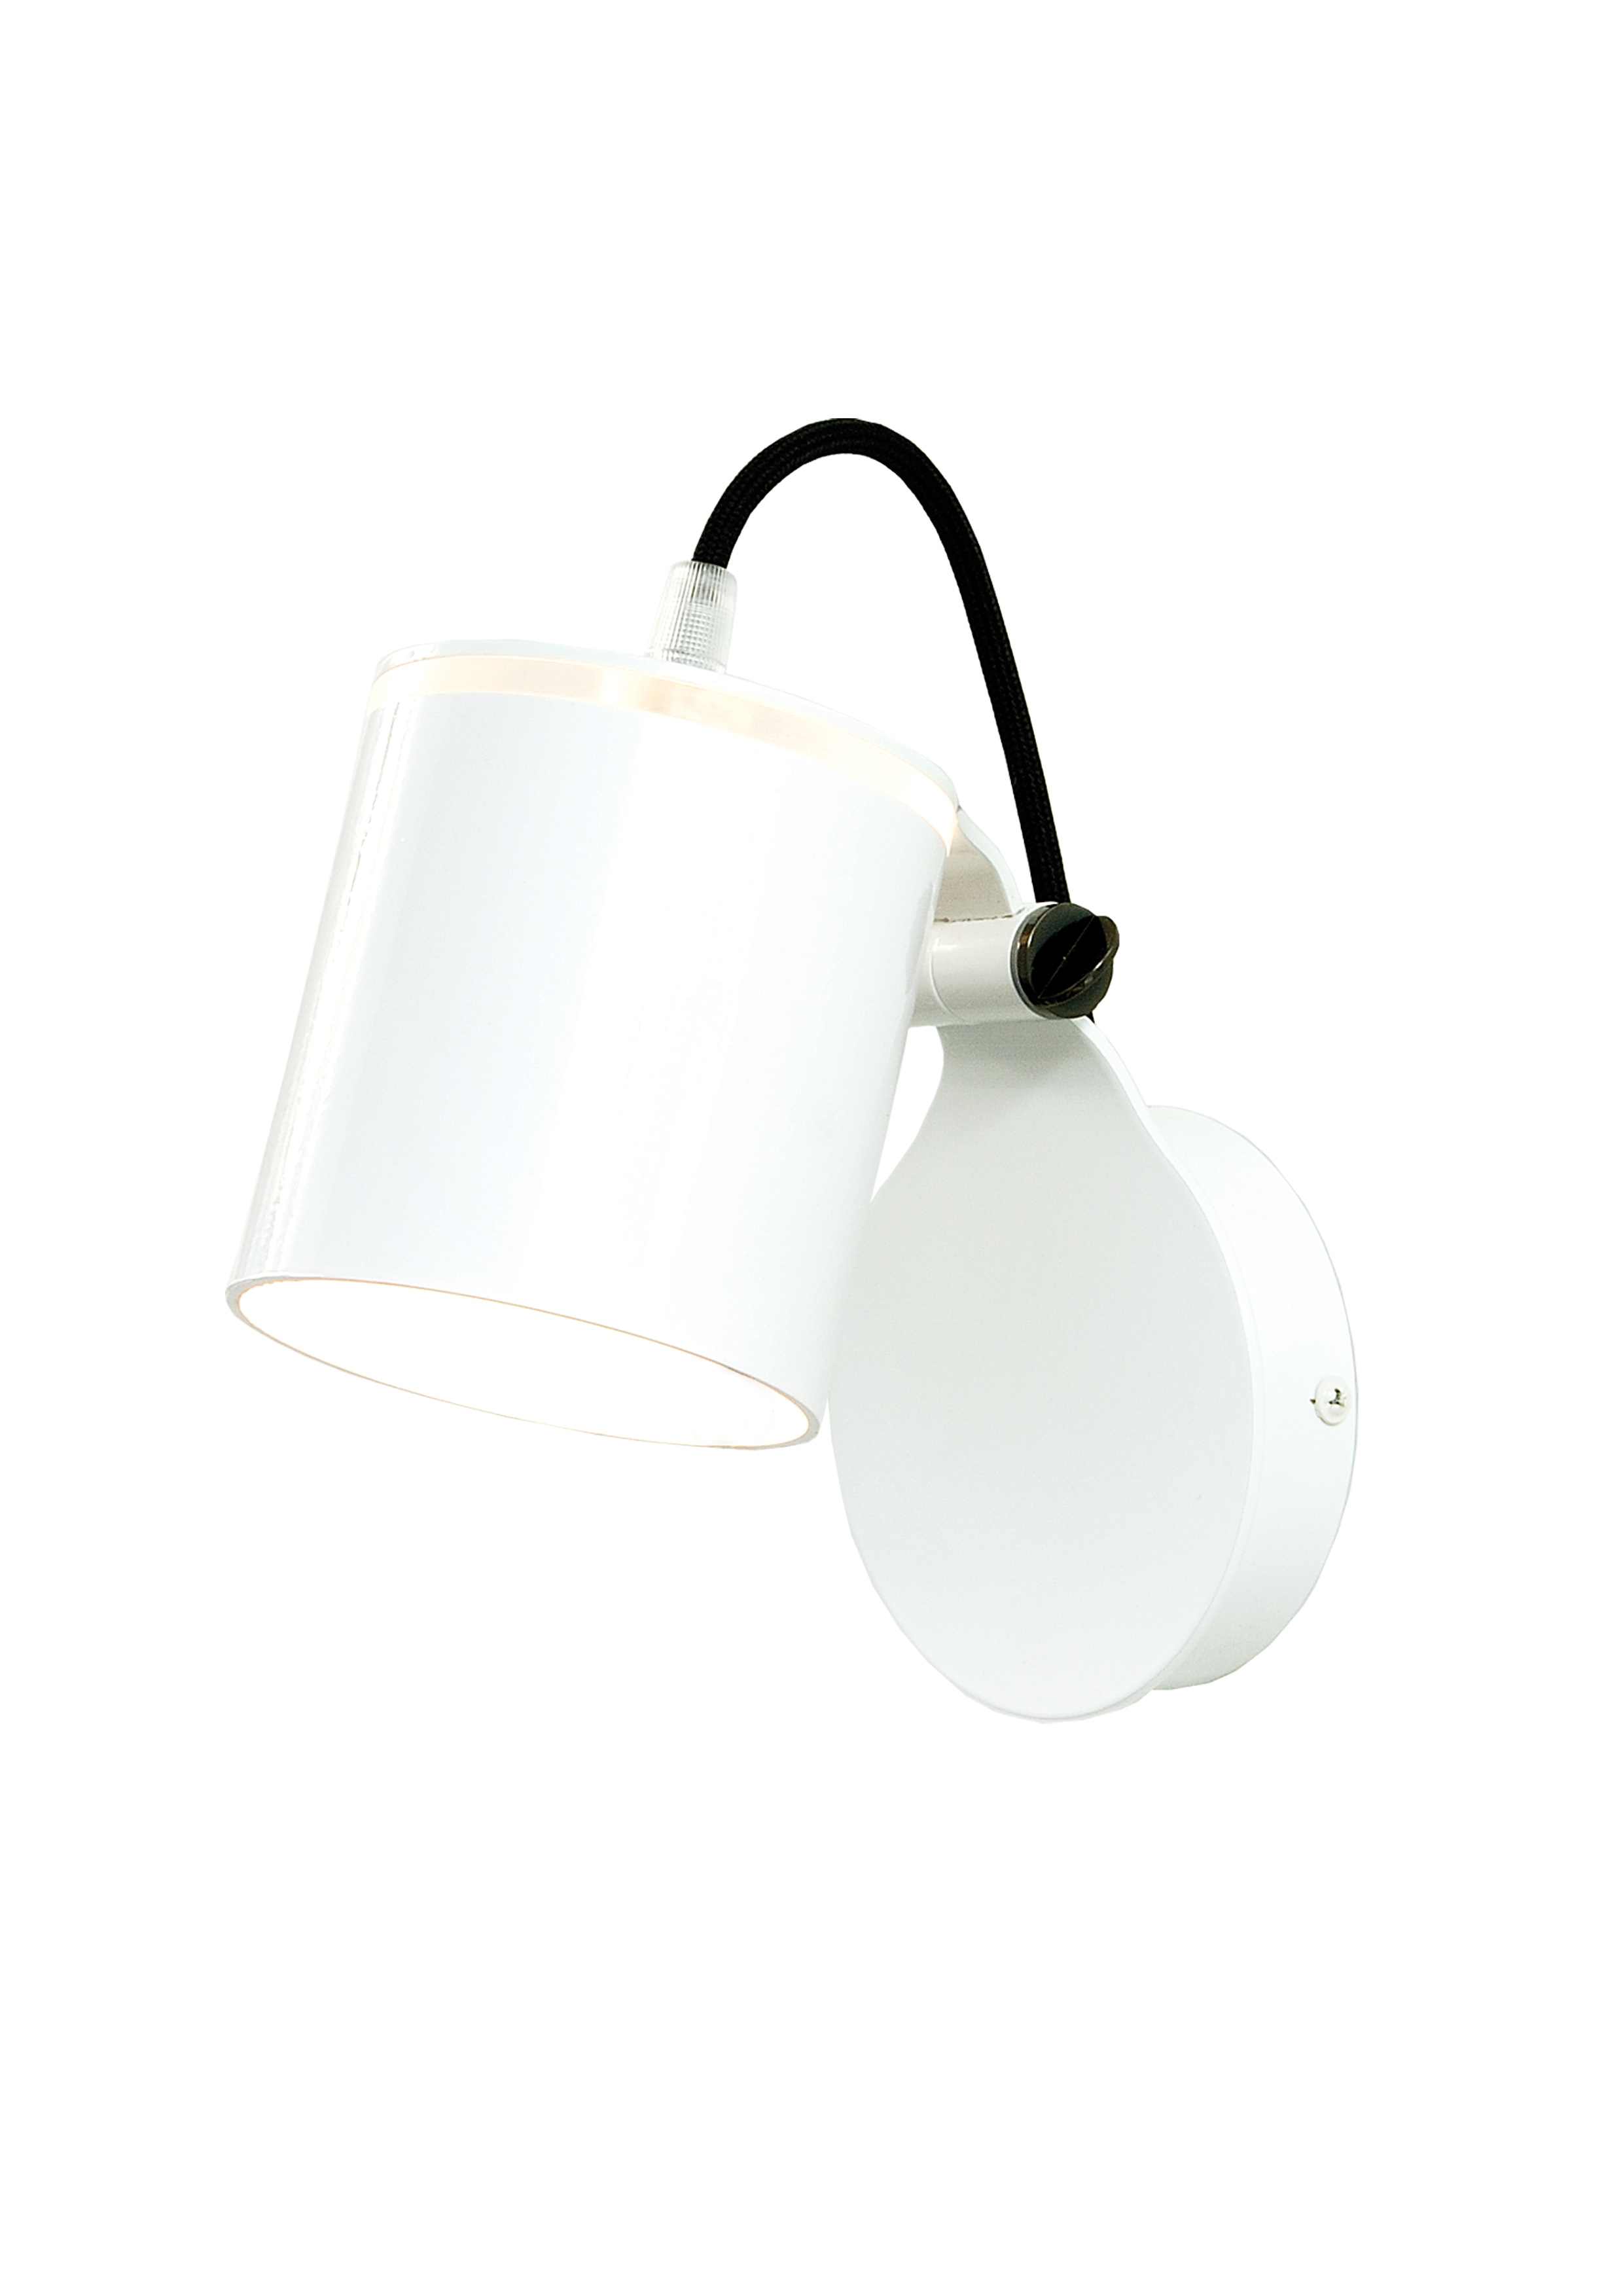 Fambuena Plume Wall Light